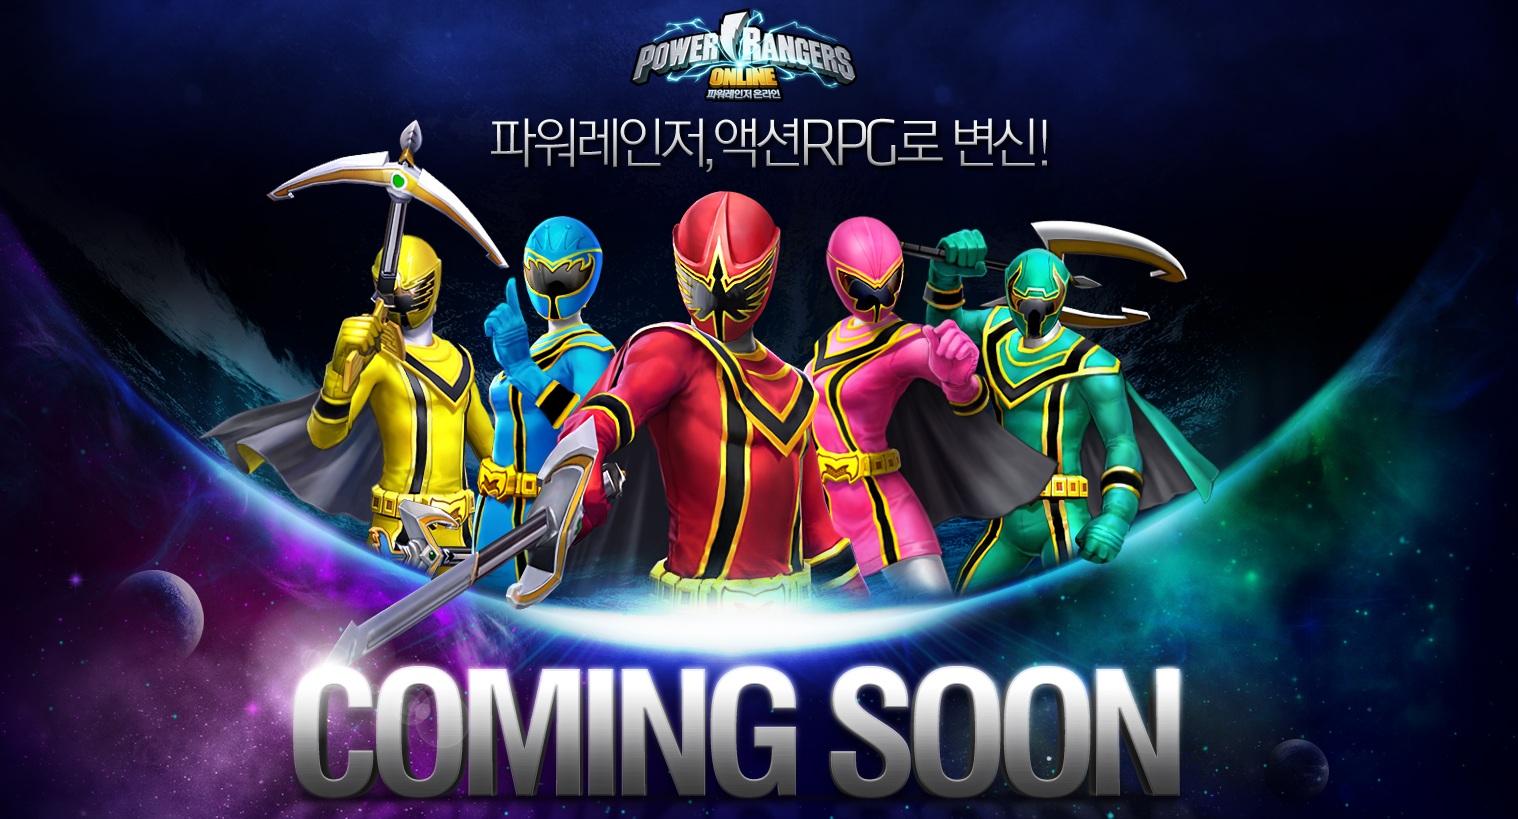 Rangers Online Rpg Online De Power Rangers Ou Quase